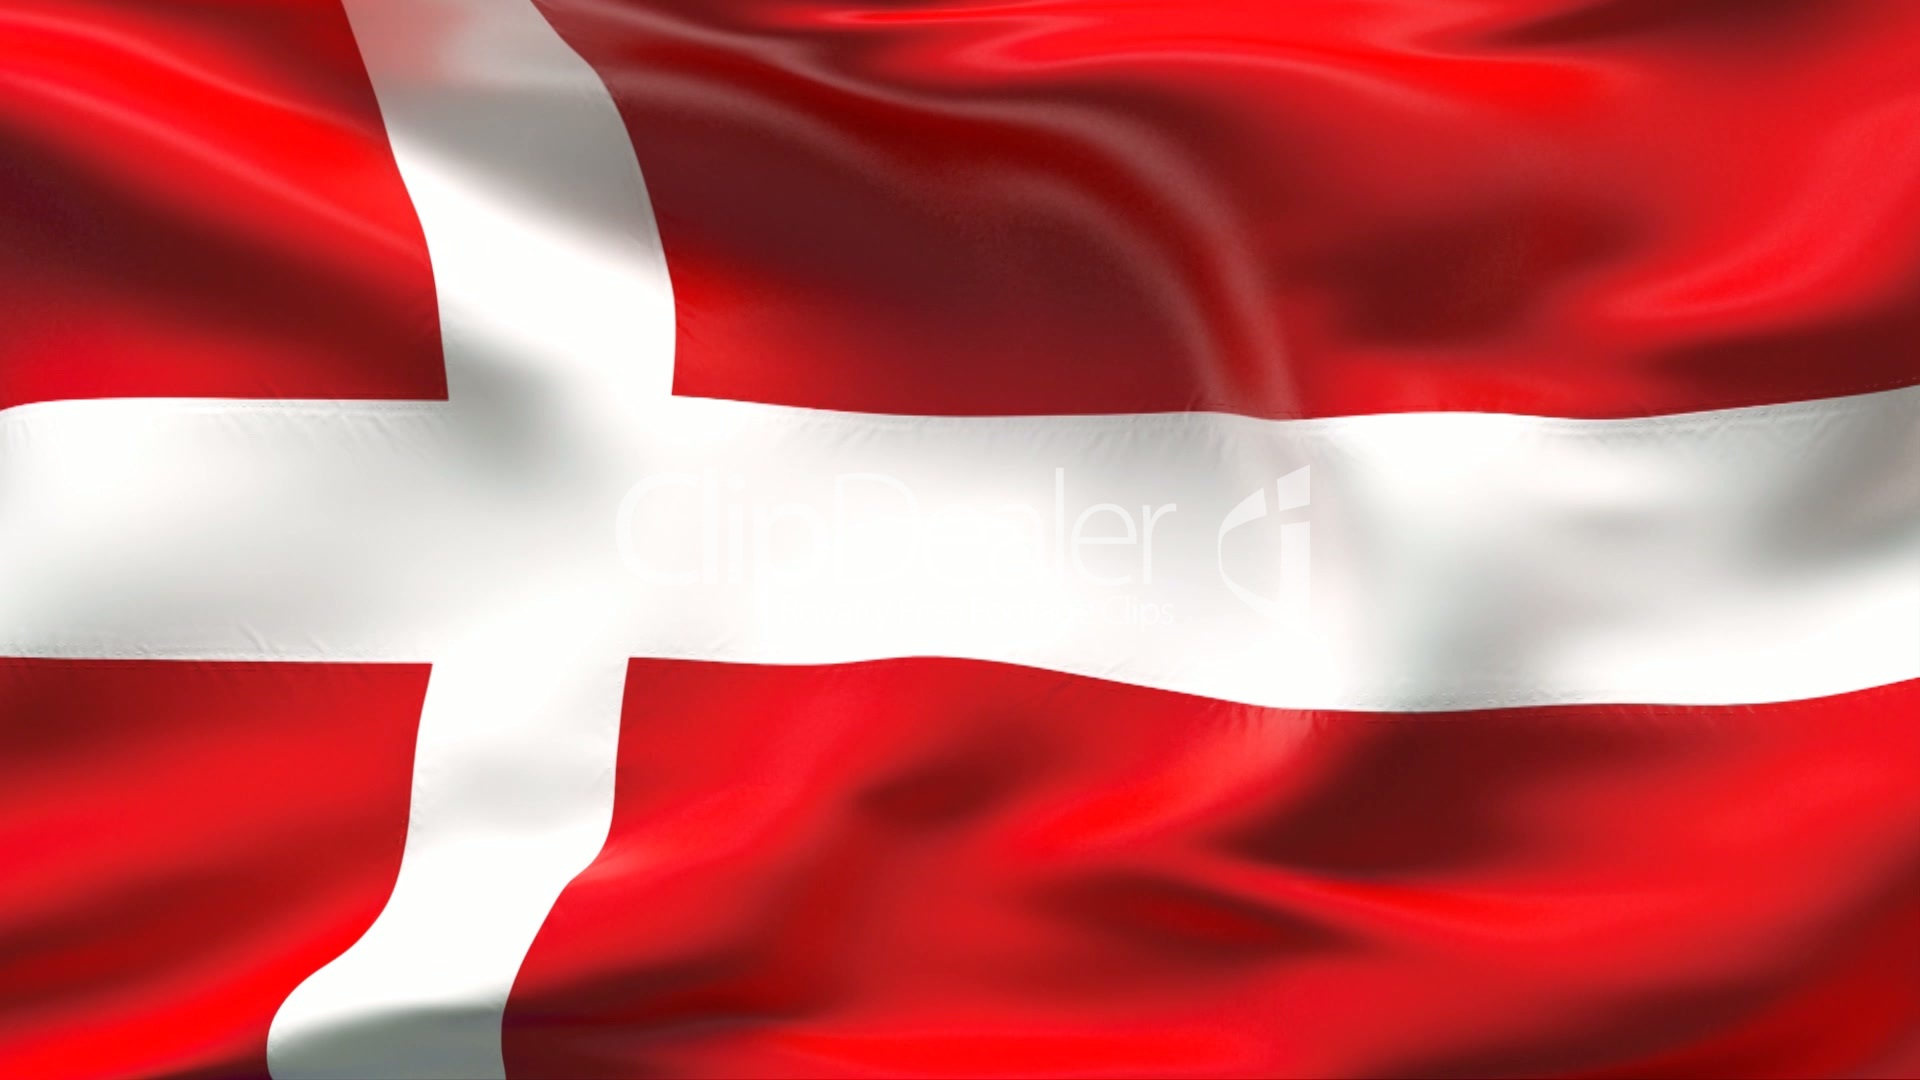 dansk eskorte time date